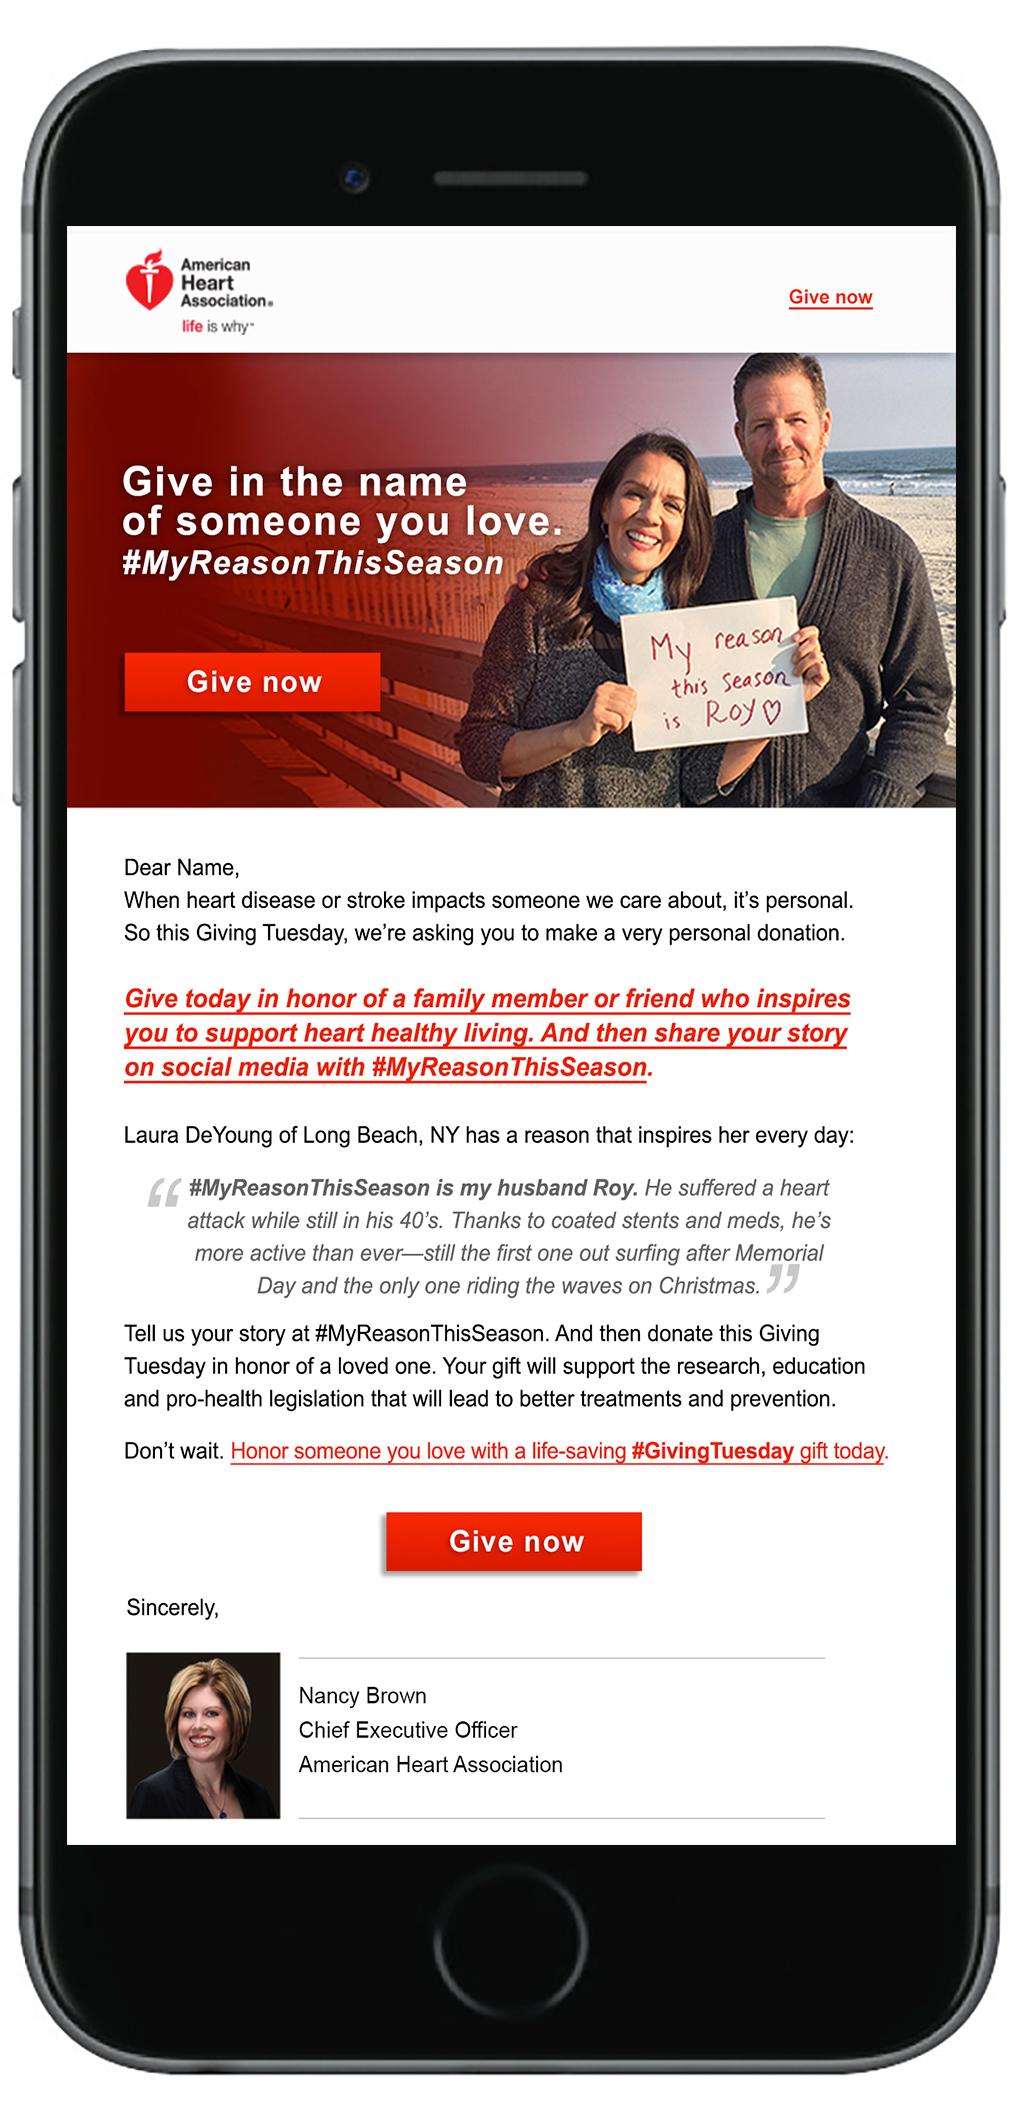 iphone AHA Roy email.jpg